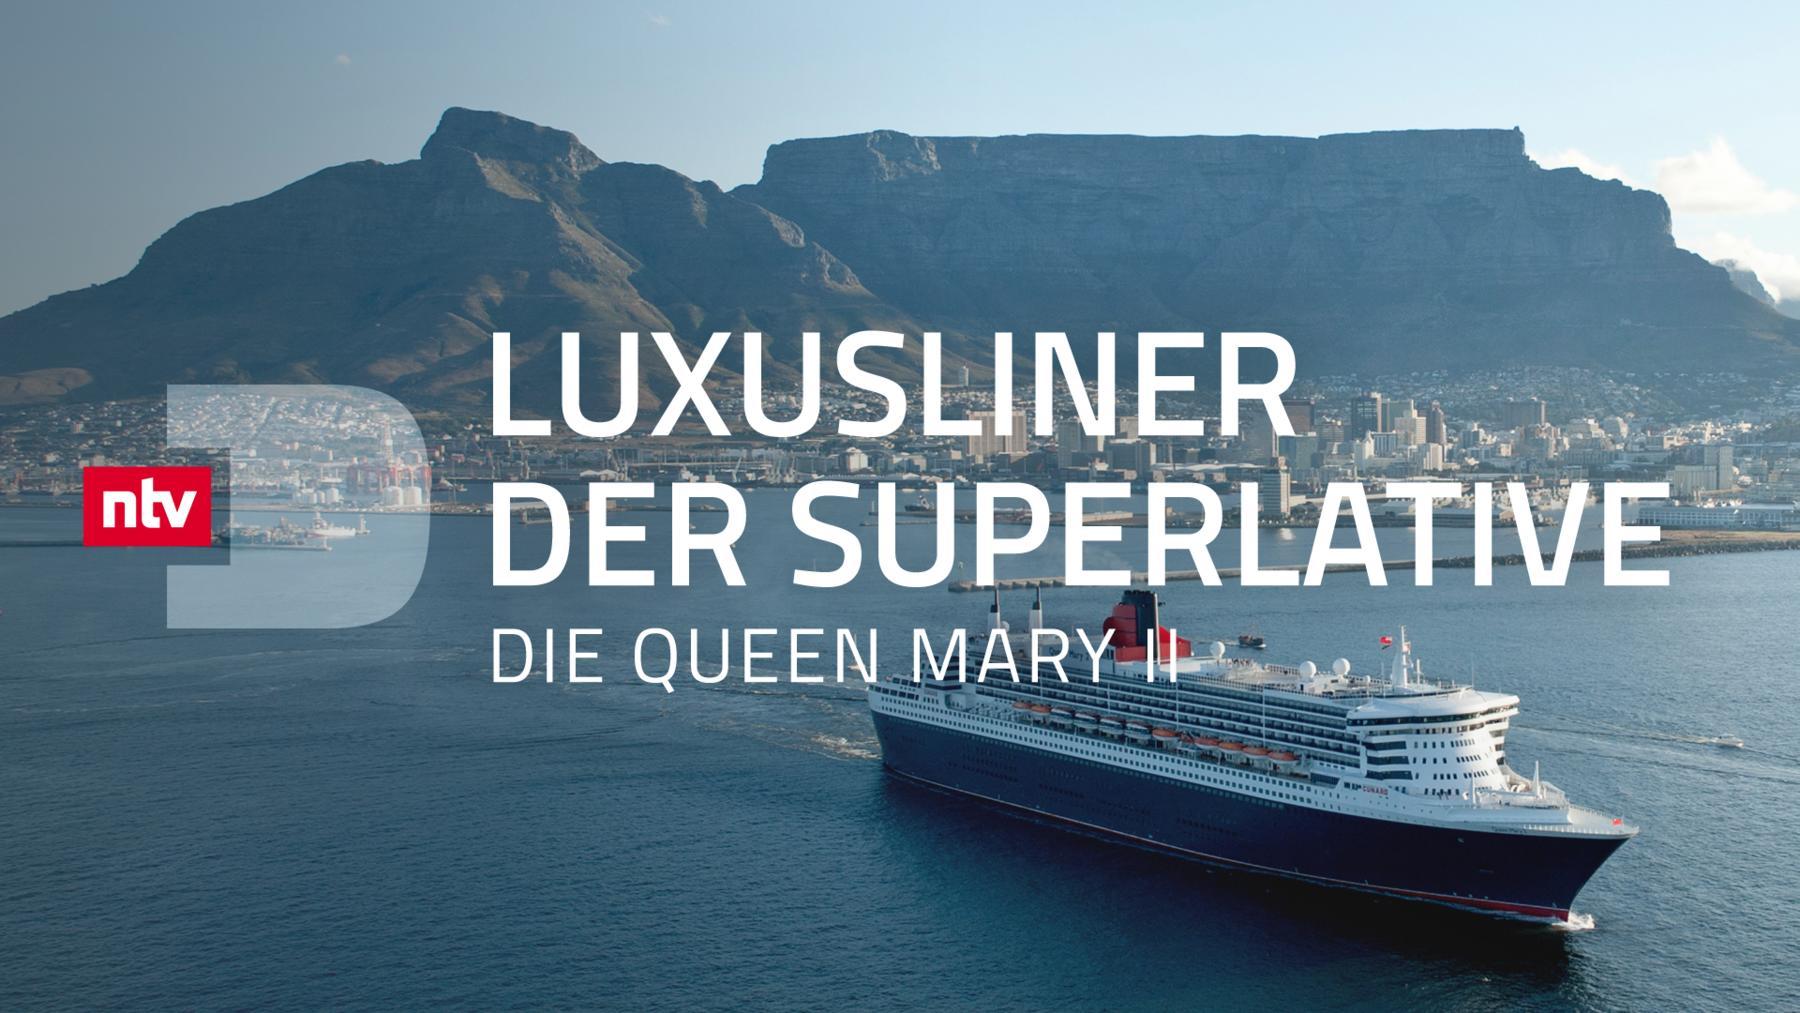 Luxusliner der Superlative - Die Queen Mary II